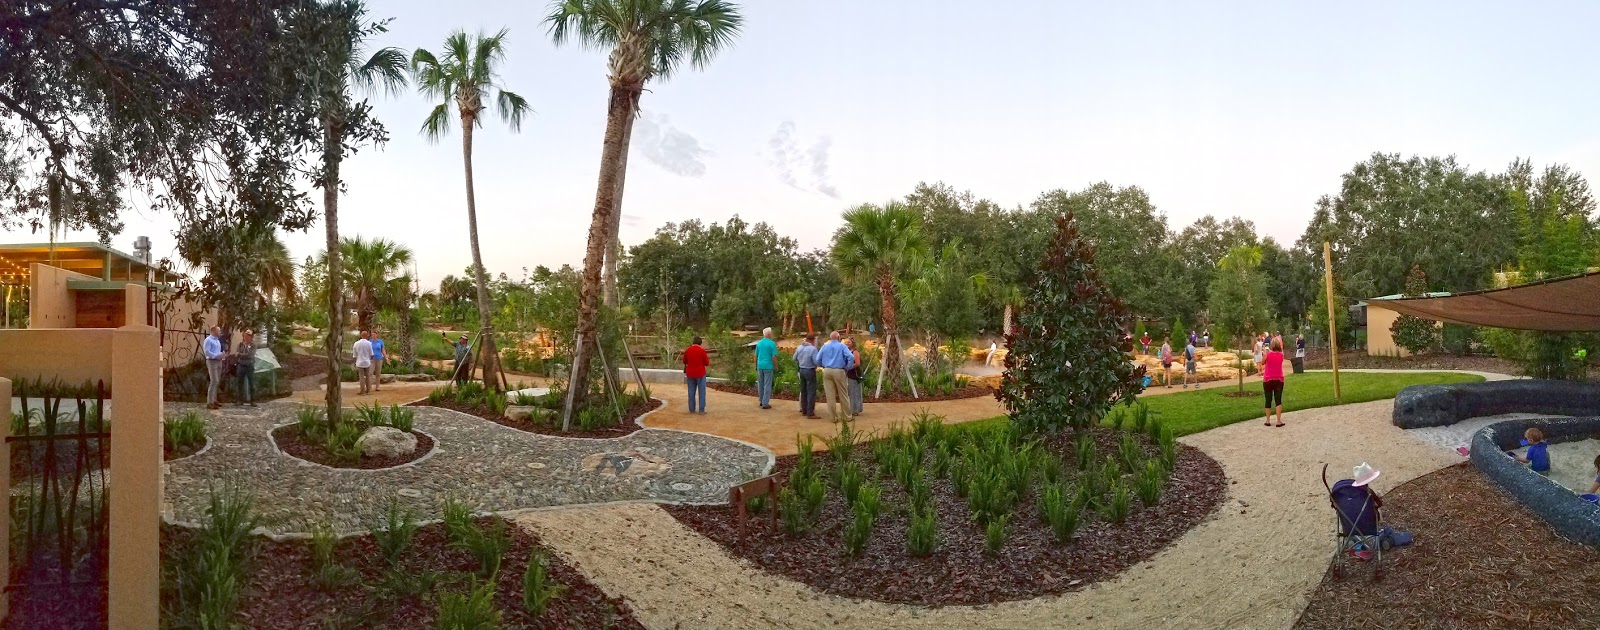 Realtor Nick Carroll - Disney area Resort Homes: Family Fun Outside ...